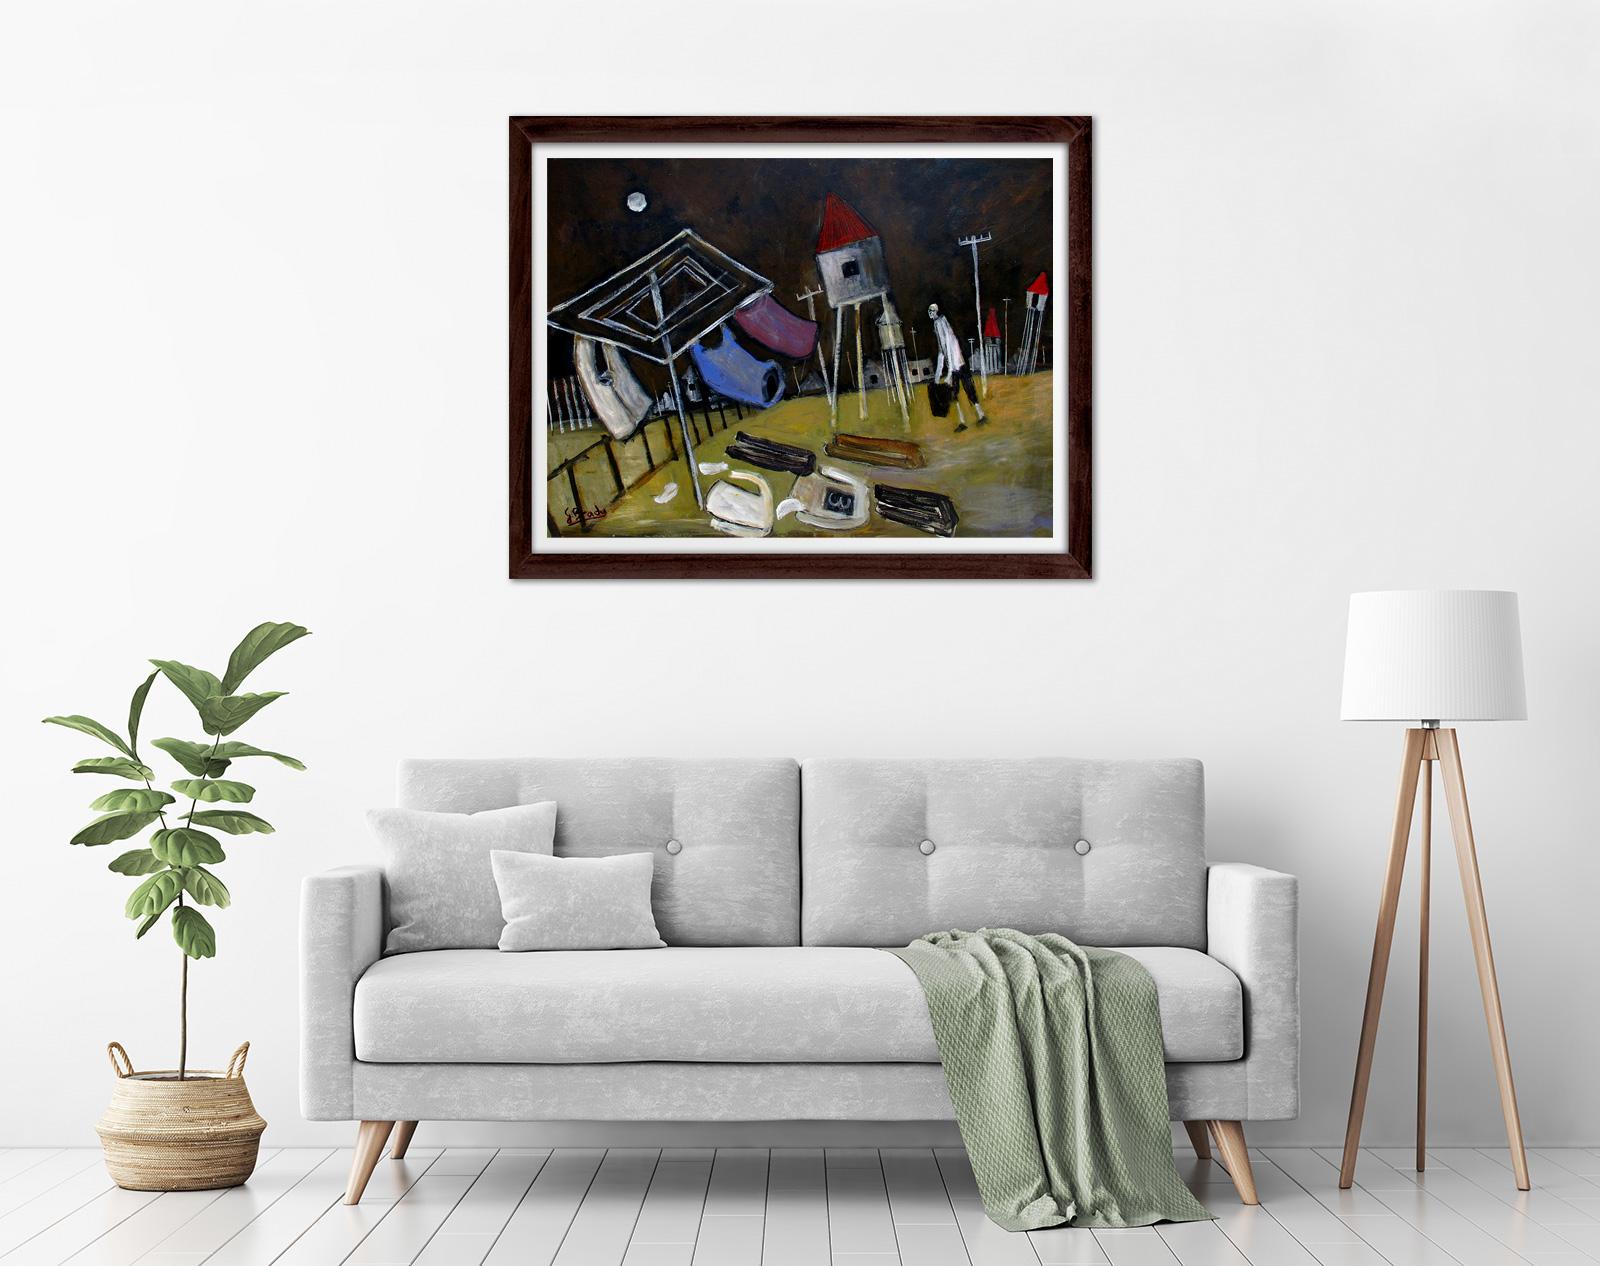 Glenn Brady - Kookaburra' Framed in a room